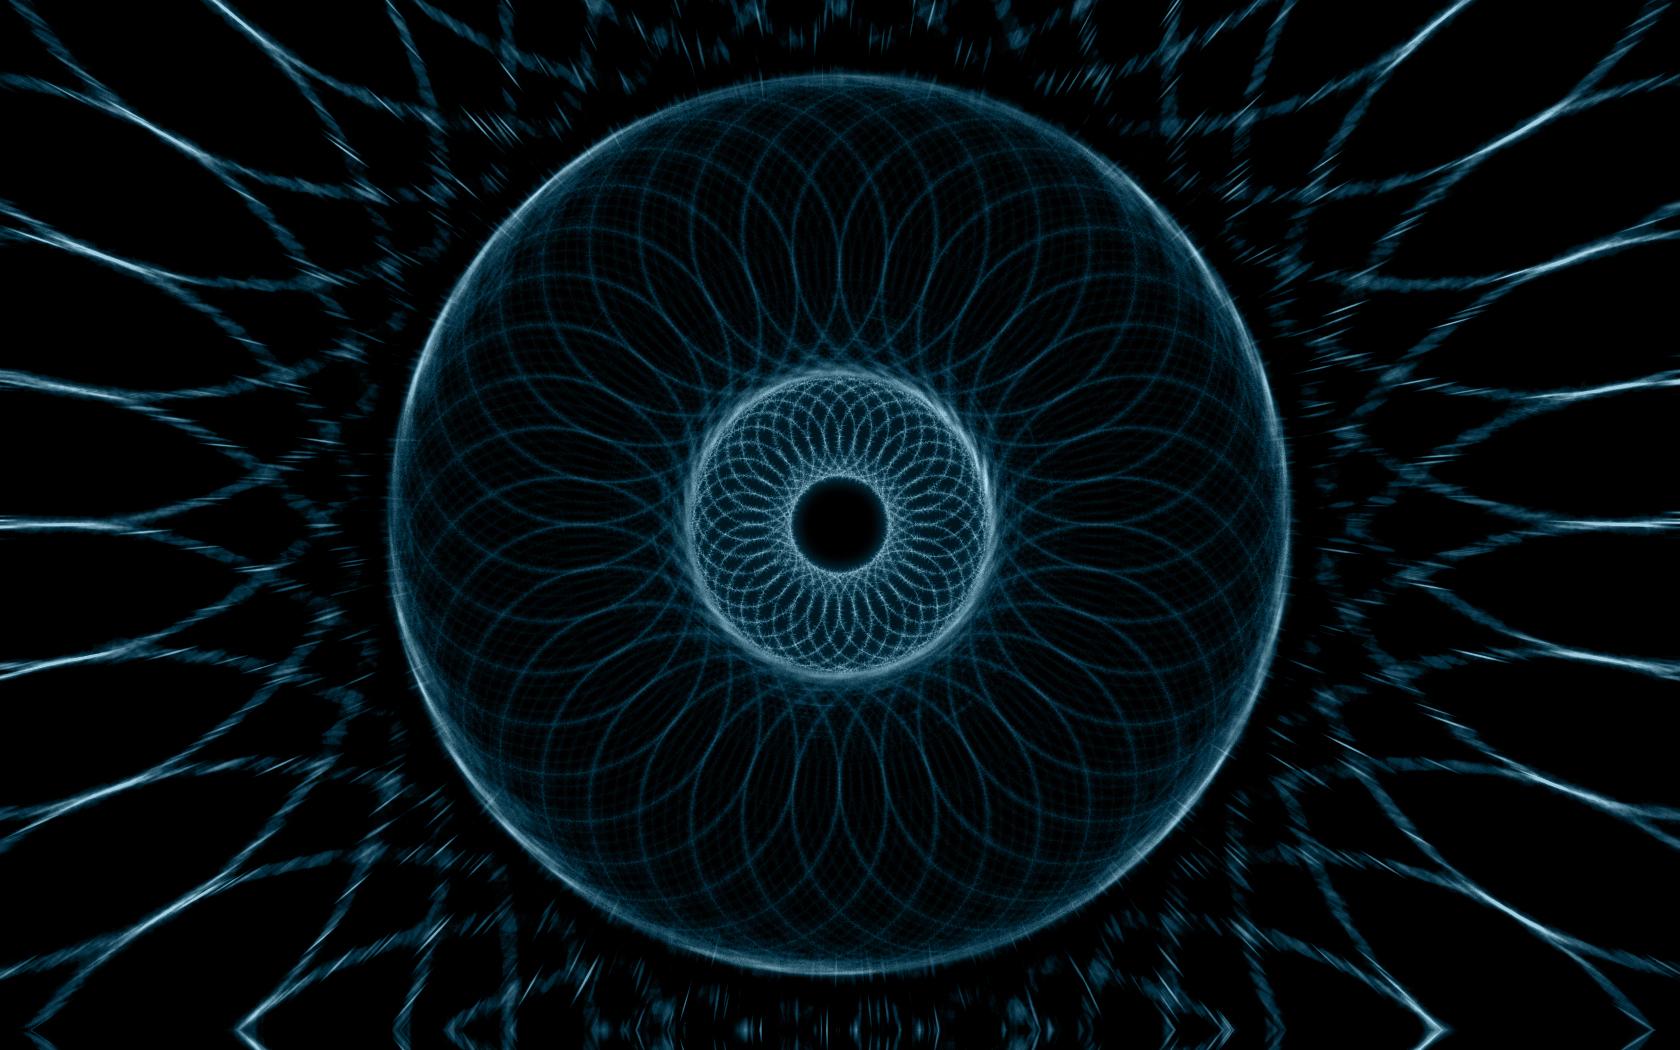 Eye of Torus